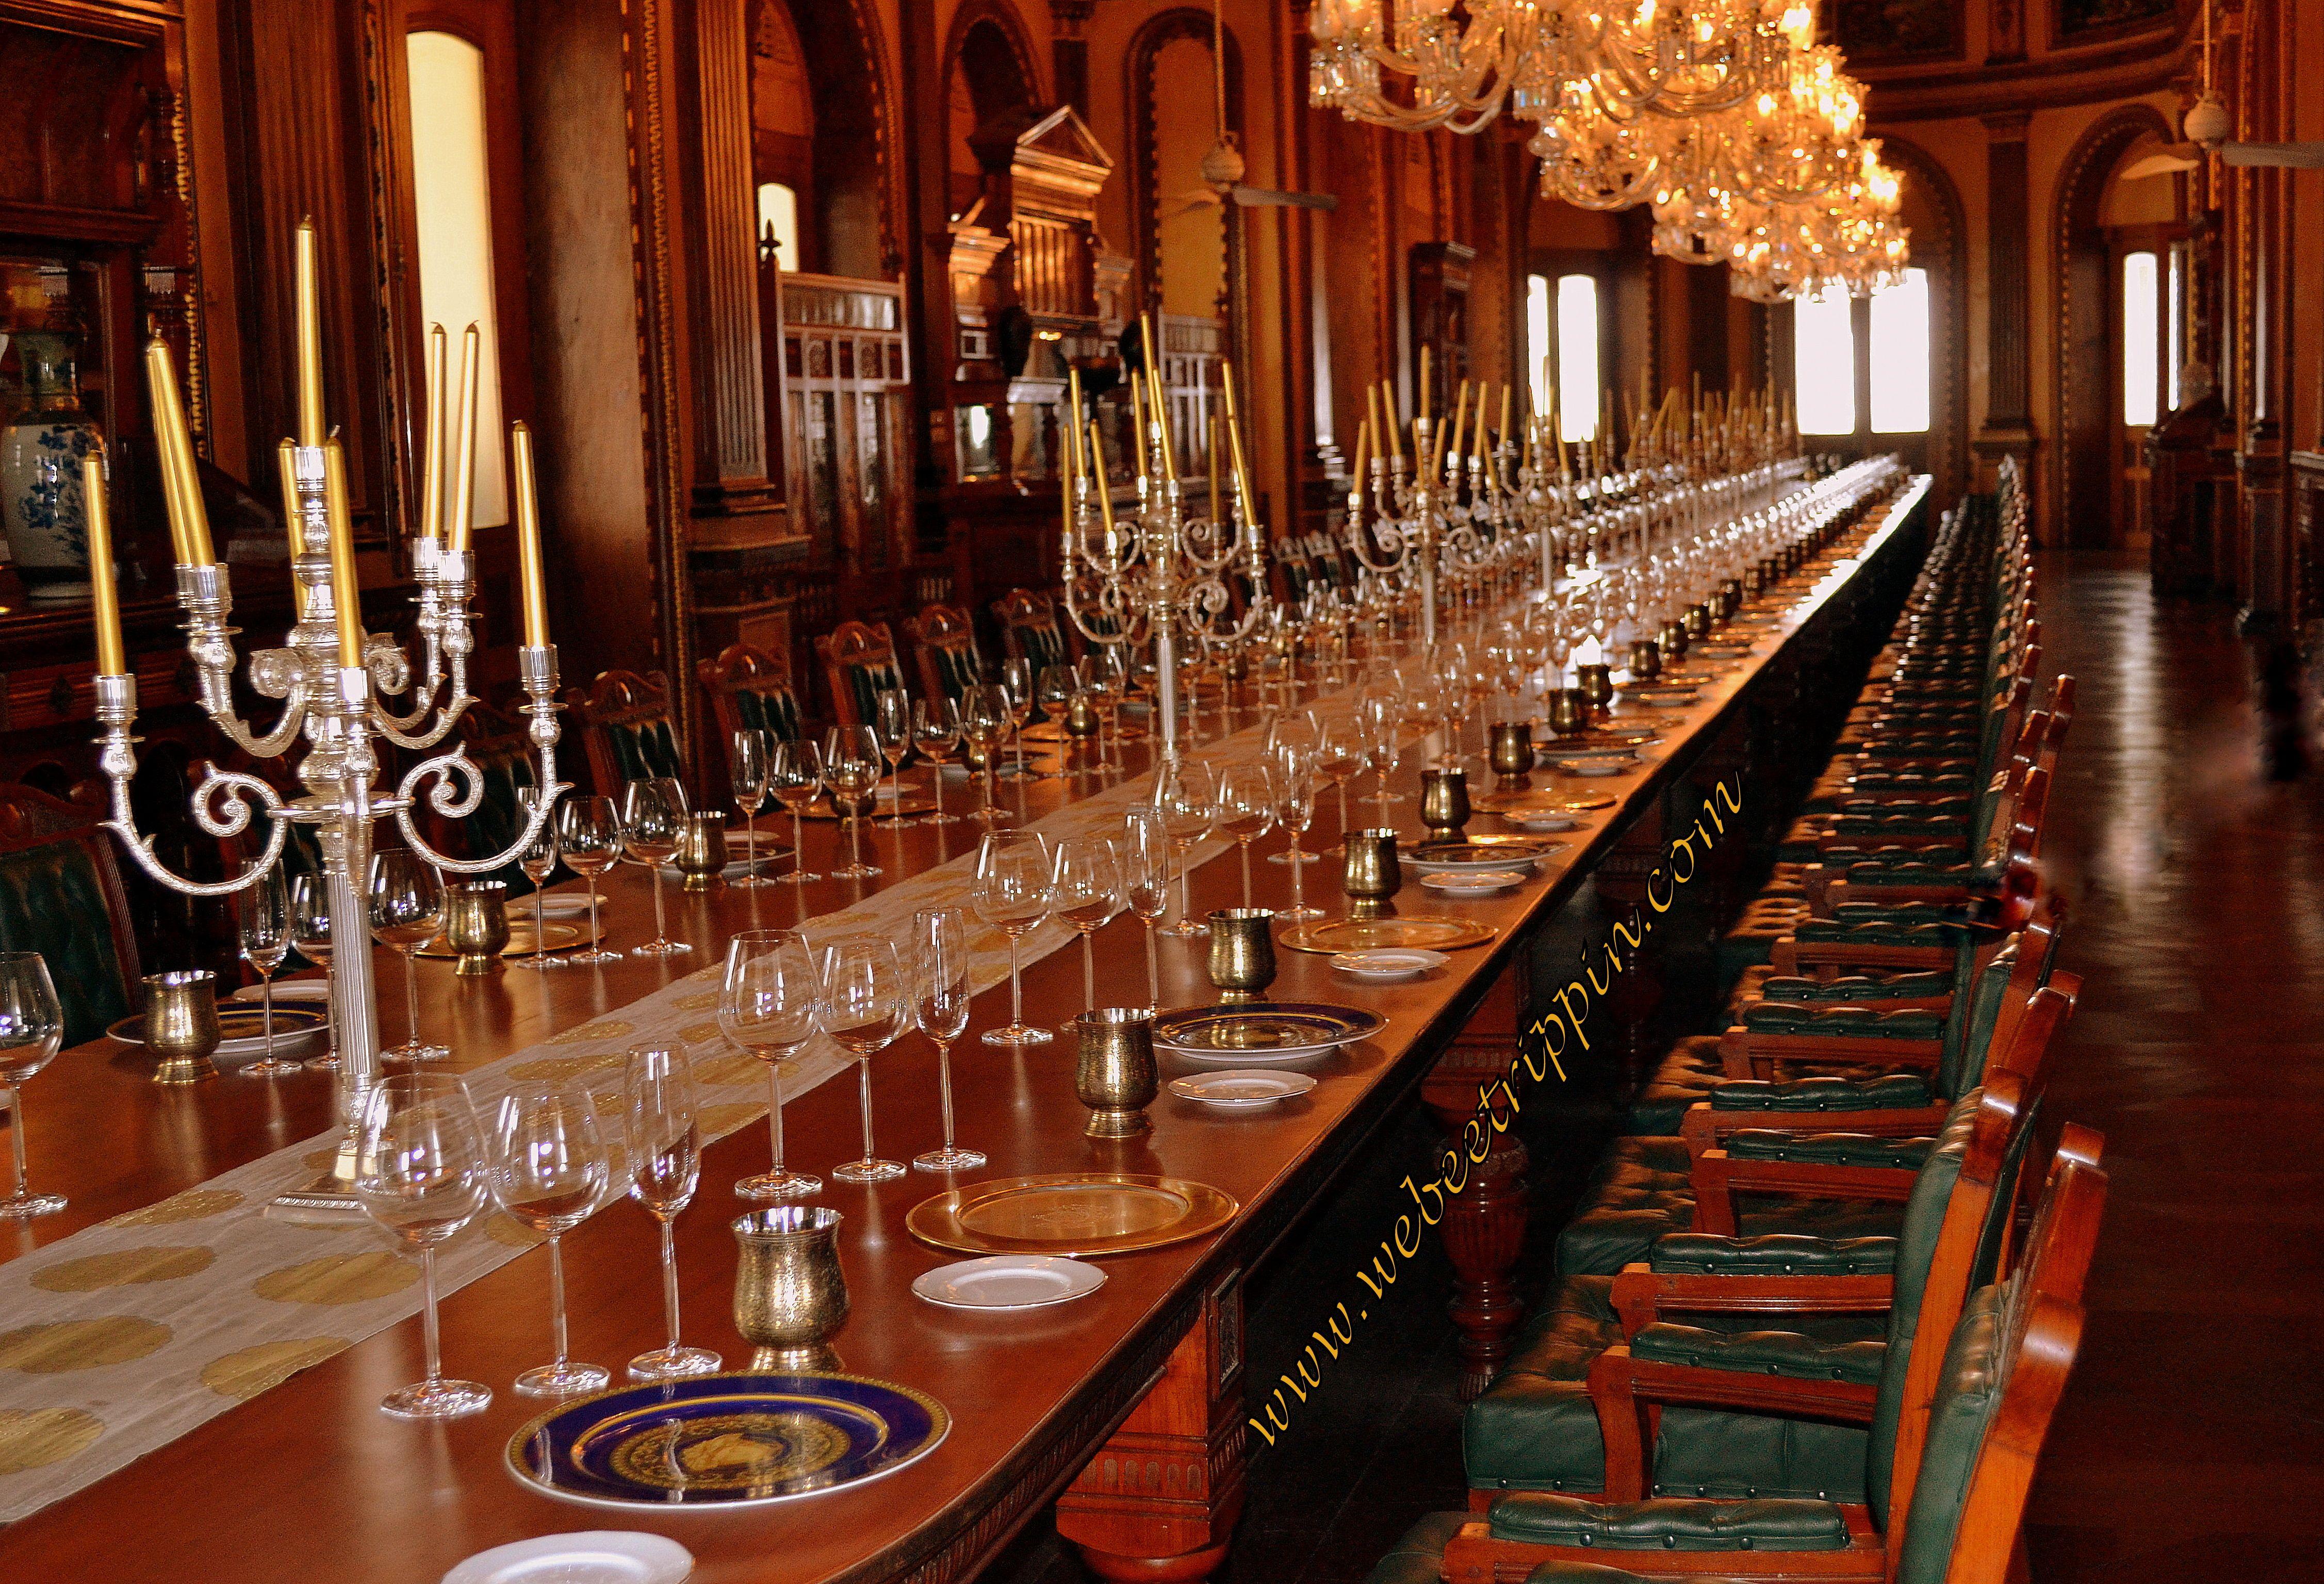 Hyderabad Taj Falaknuma Palace Grand Dining Table Said to be